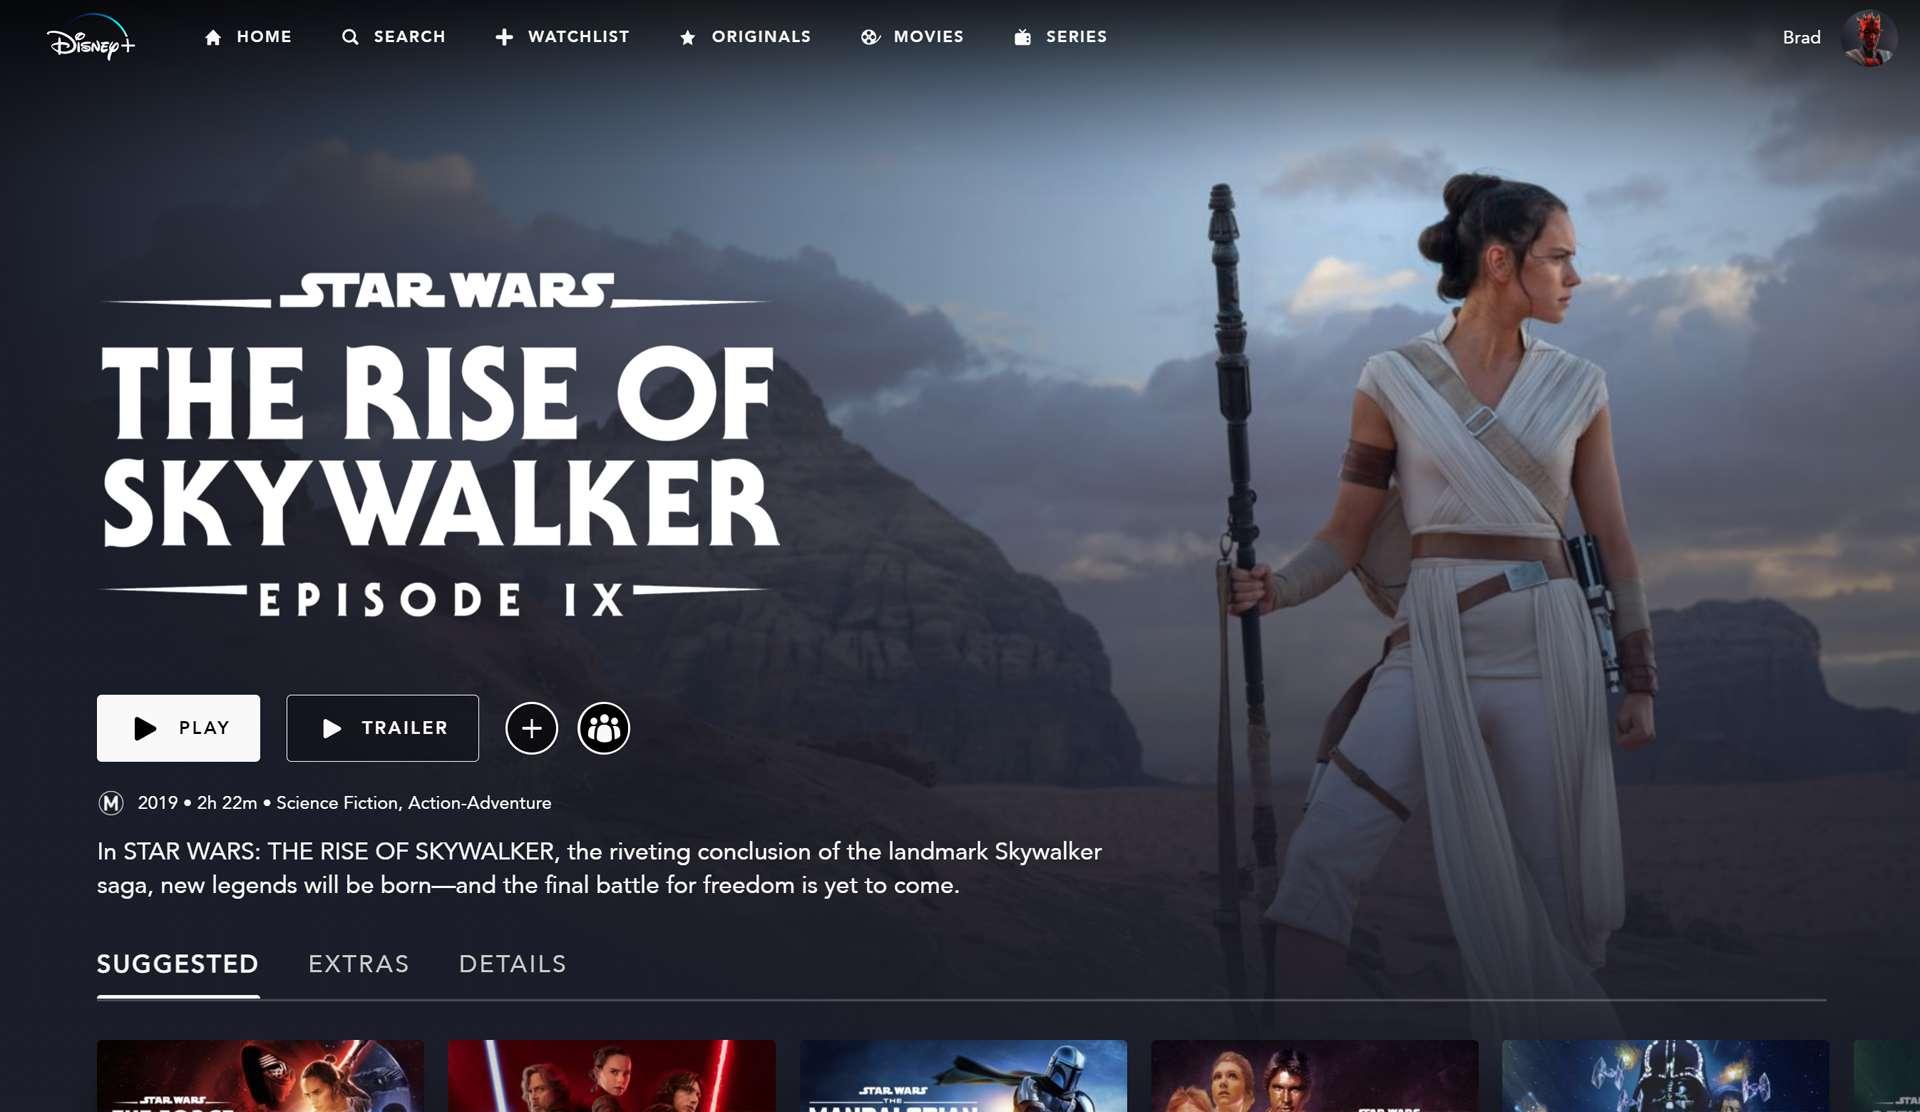 Daisy Ridley as Rey in Star Wars Episode IX The Rise of Skywalker on Disney+.